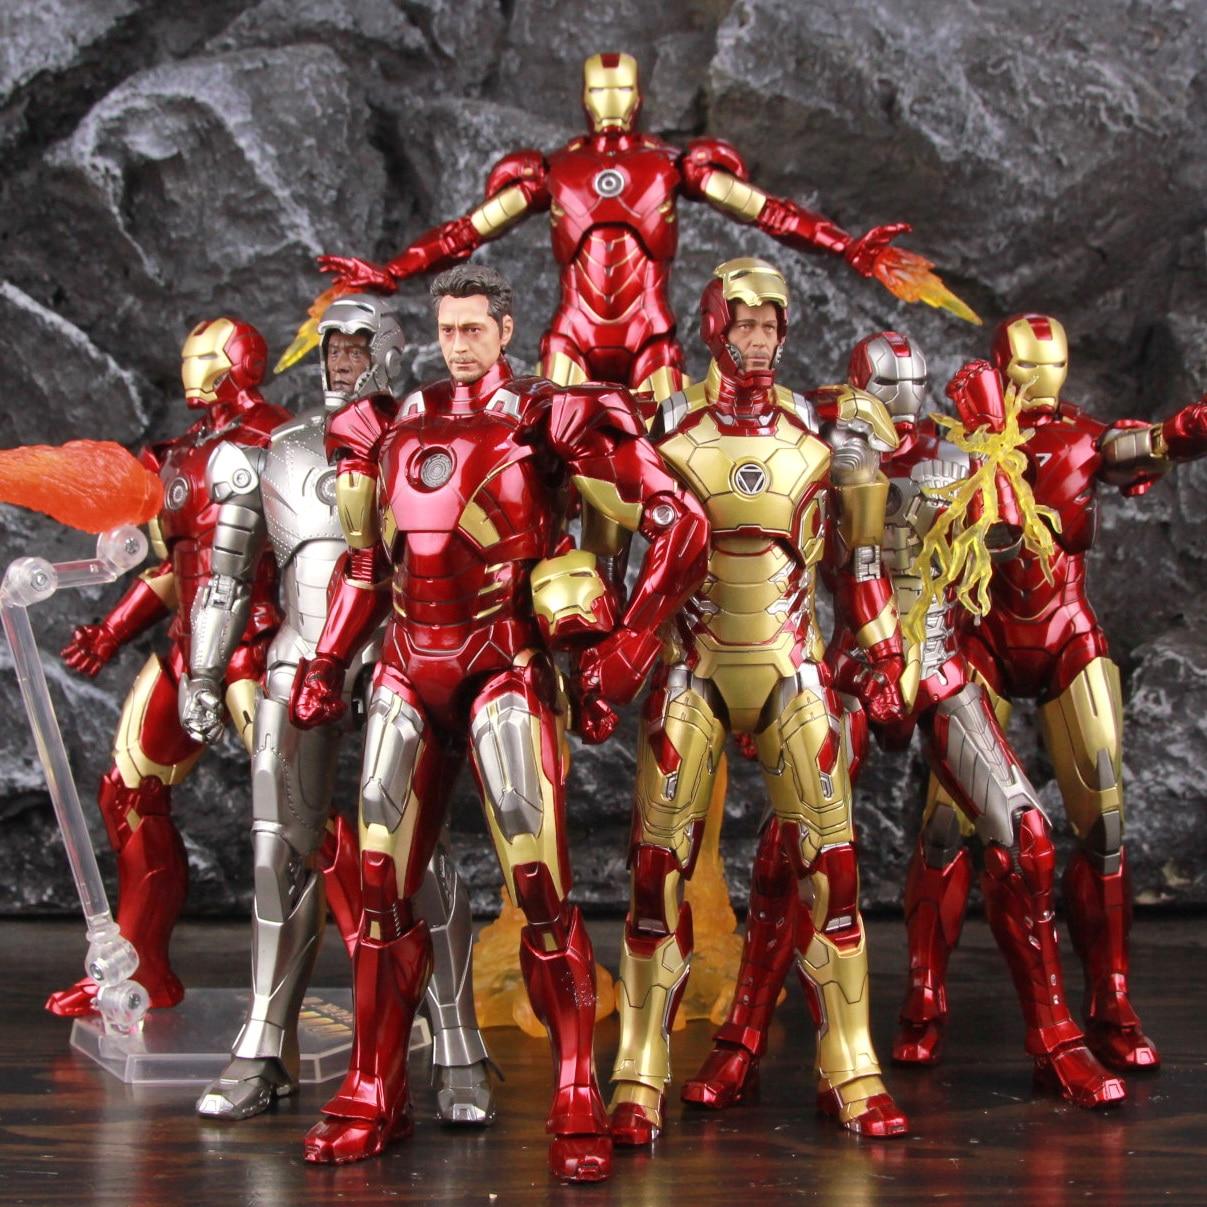 Marvel Iron Man MK42 MK2 MK3 MK4 MK5 MK6 MK7 7